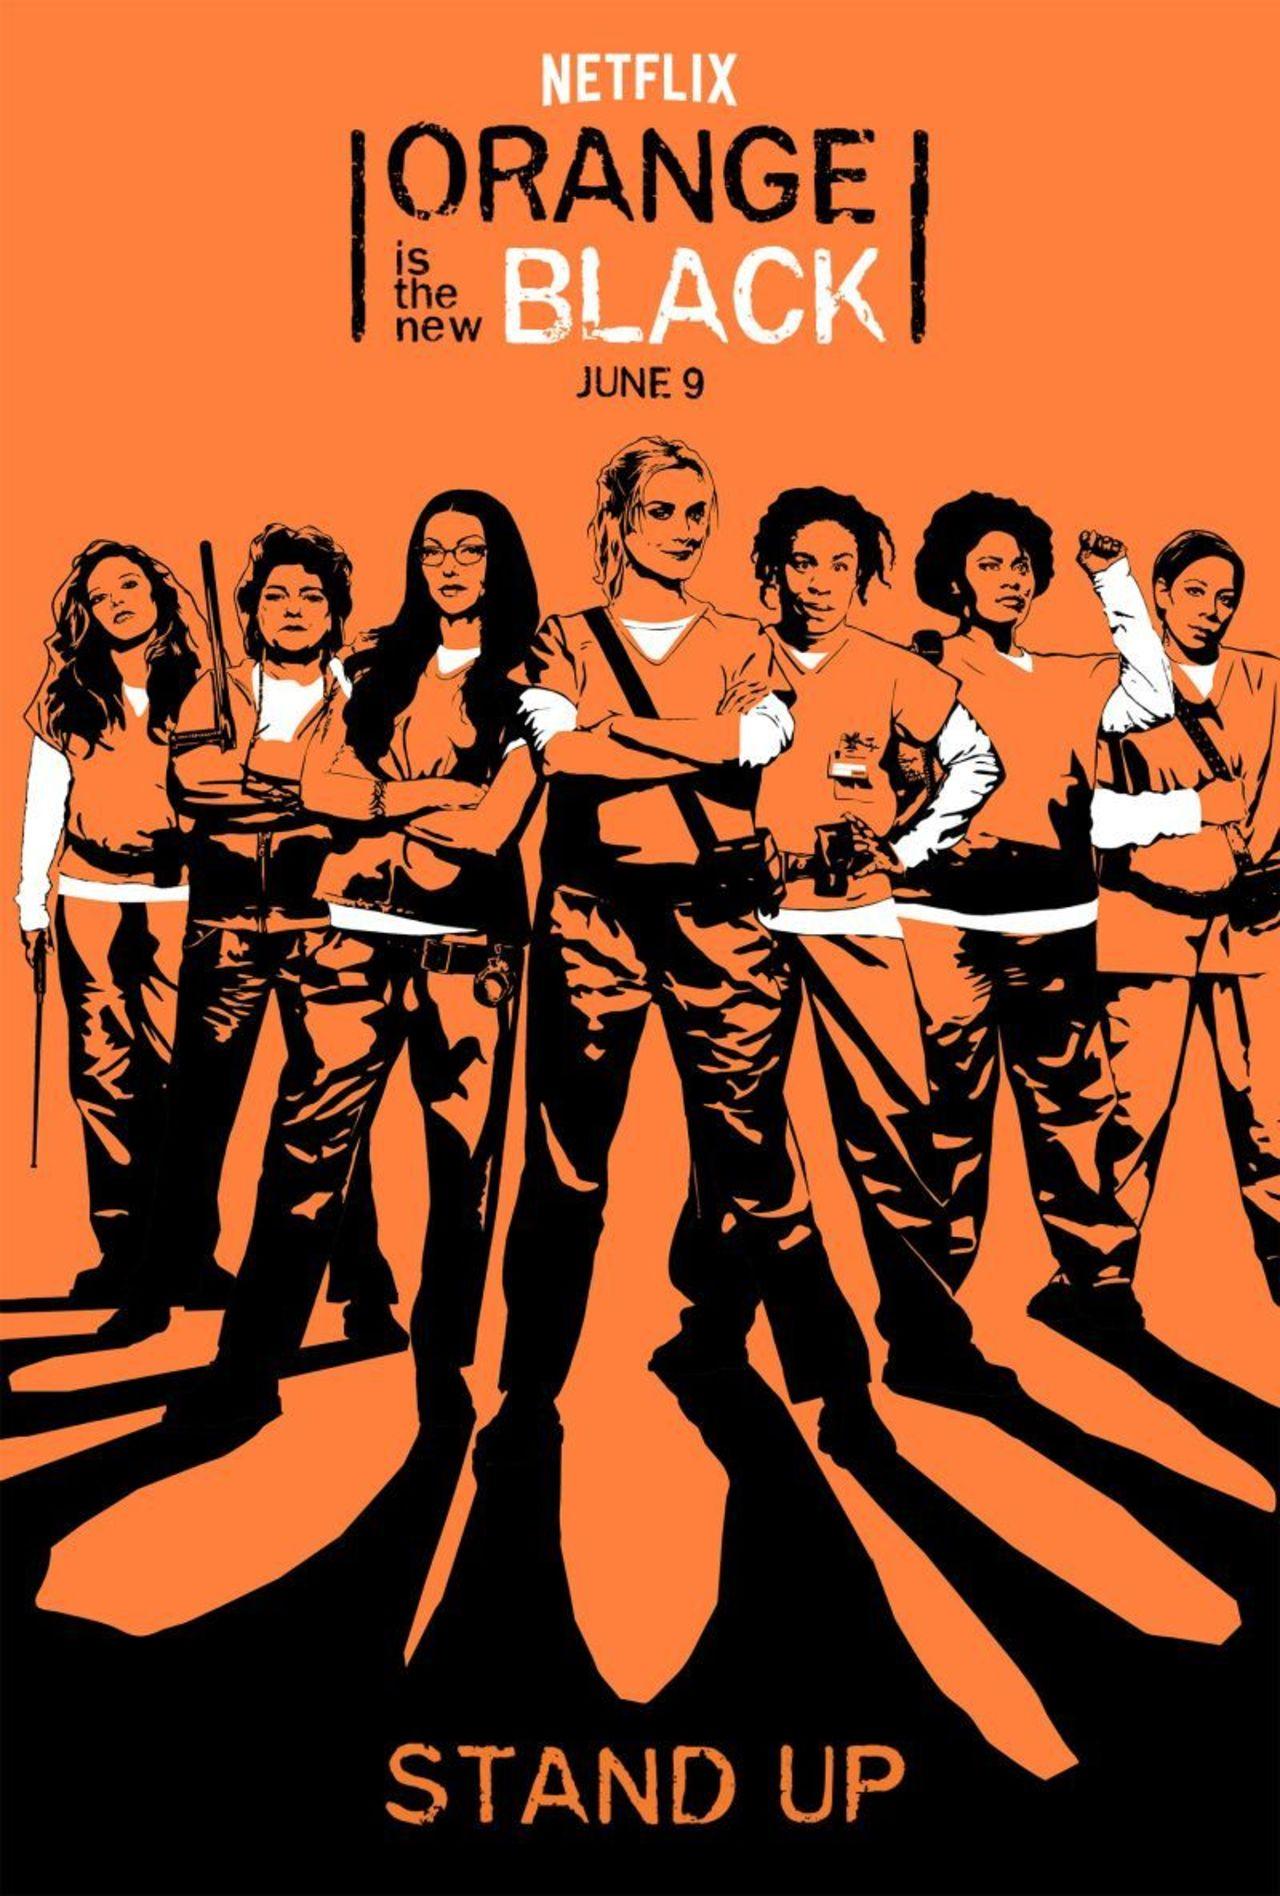 orange-is-the-new-black-season-5-key-art-image005-1497020625088_1280w.jpg